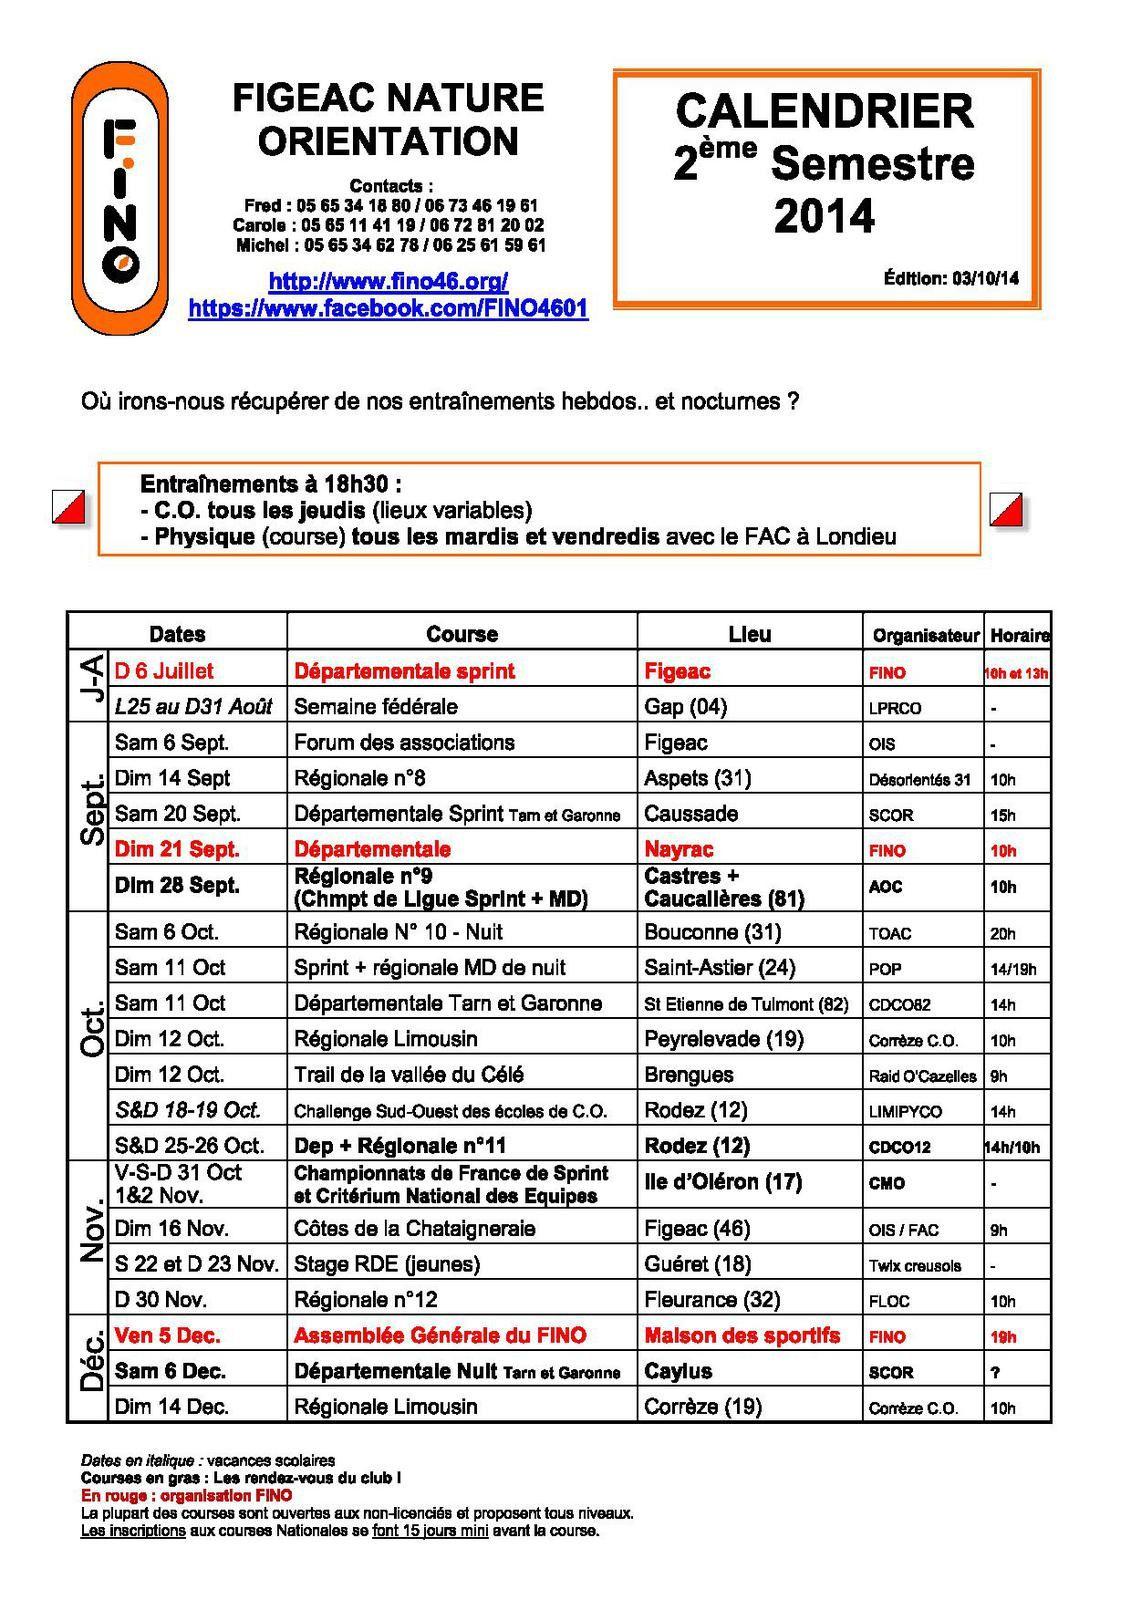 Calendrier 2ème semestre 2014